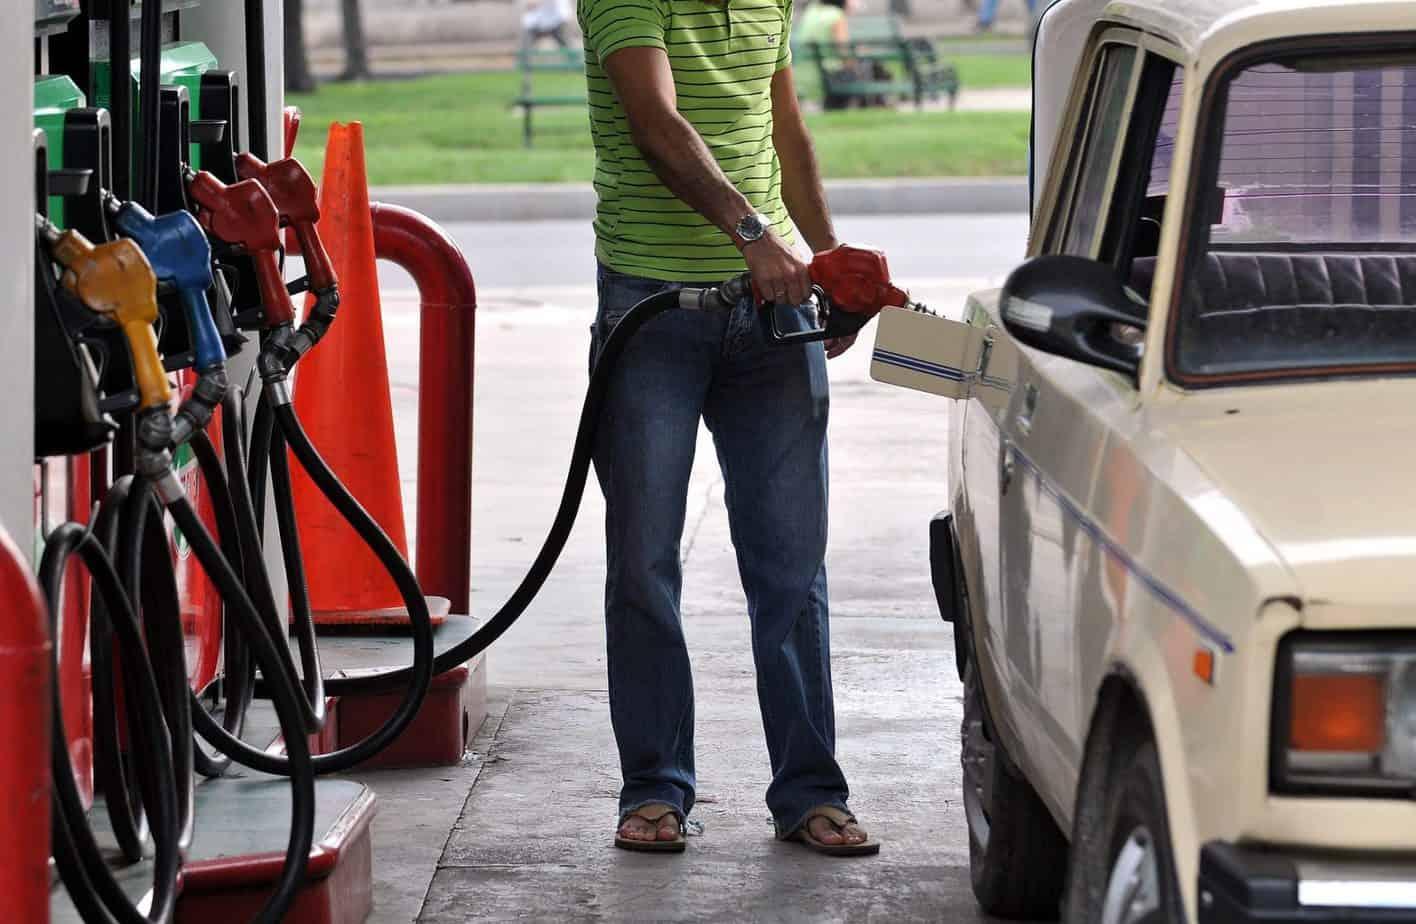 Este cubano intentó regresar a Cuba con 345 galones de gasolina